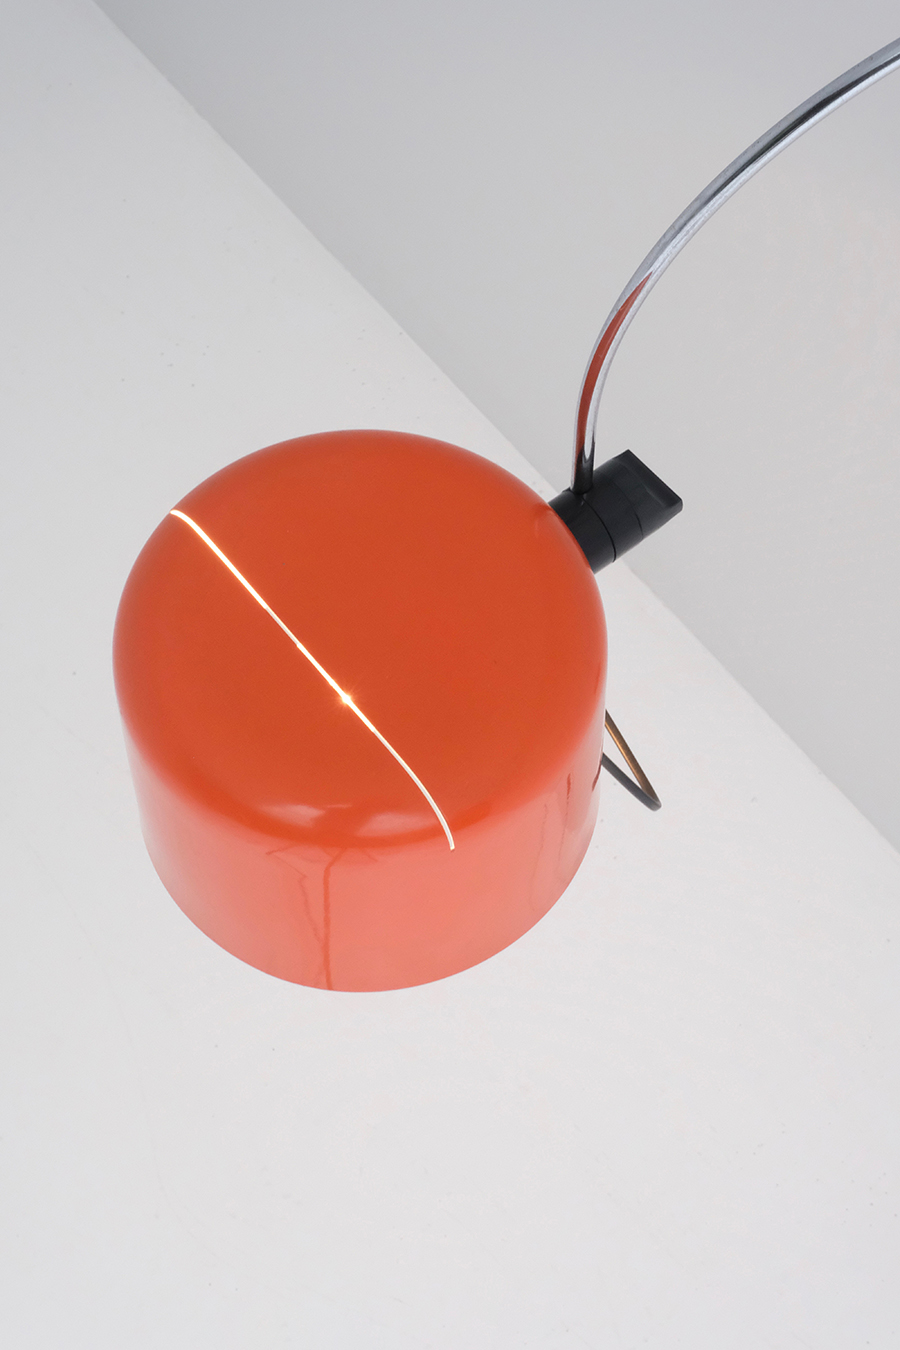 JOE COLOMBO FOR OLUCE COUPE WALL LAMPimage 5